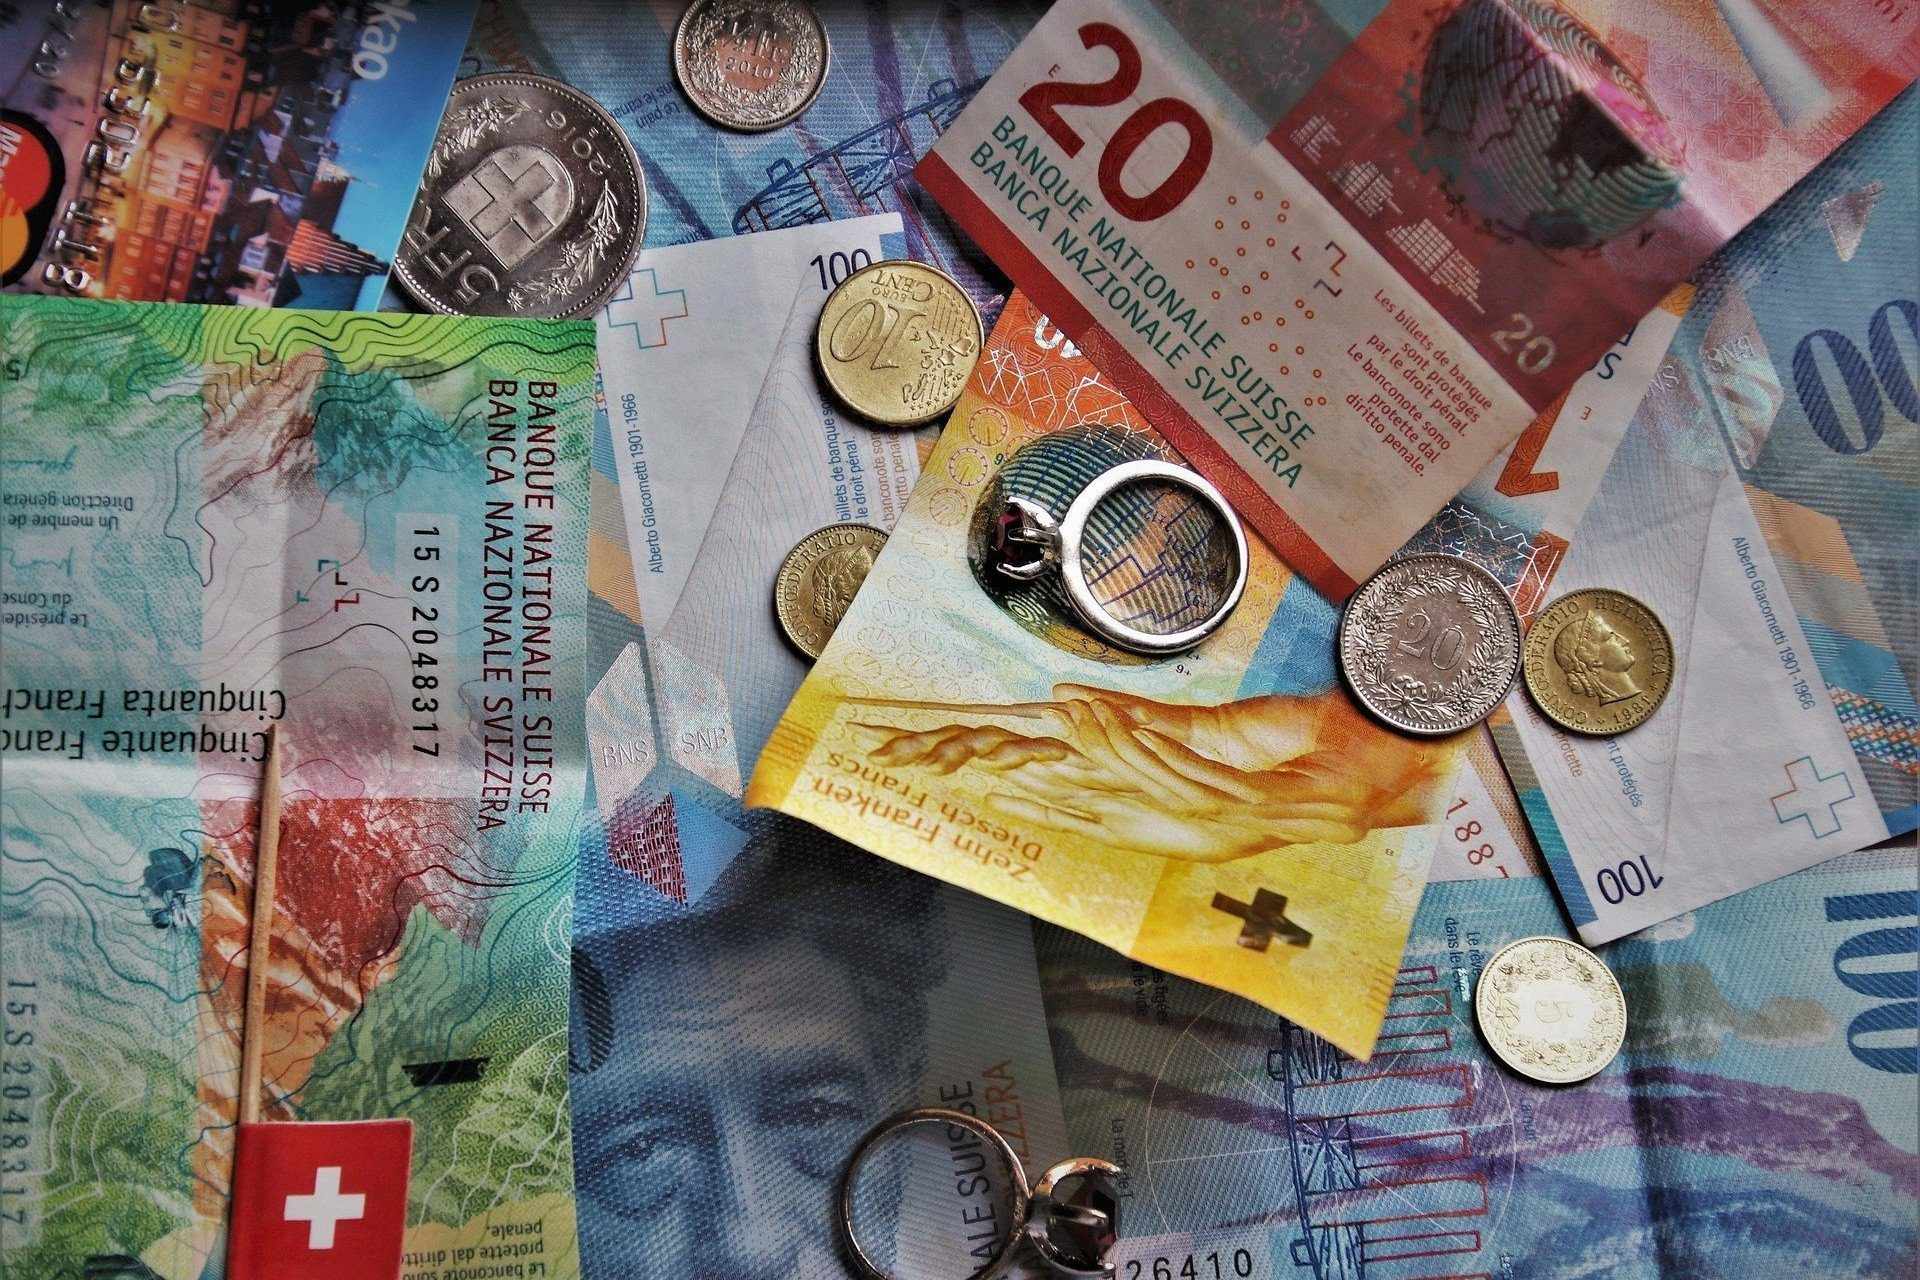 kredyty-frankowe-kancelaria-adwokat